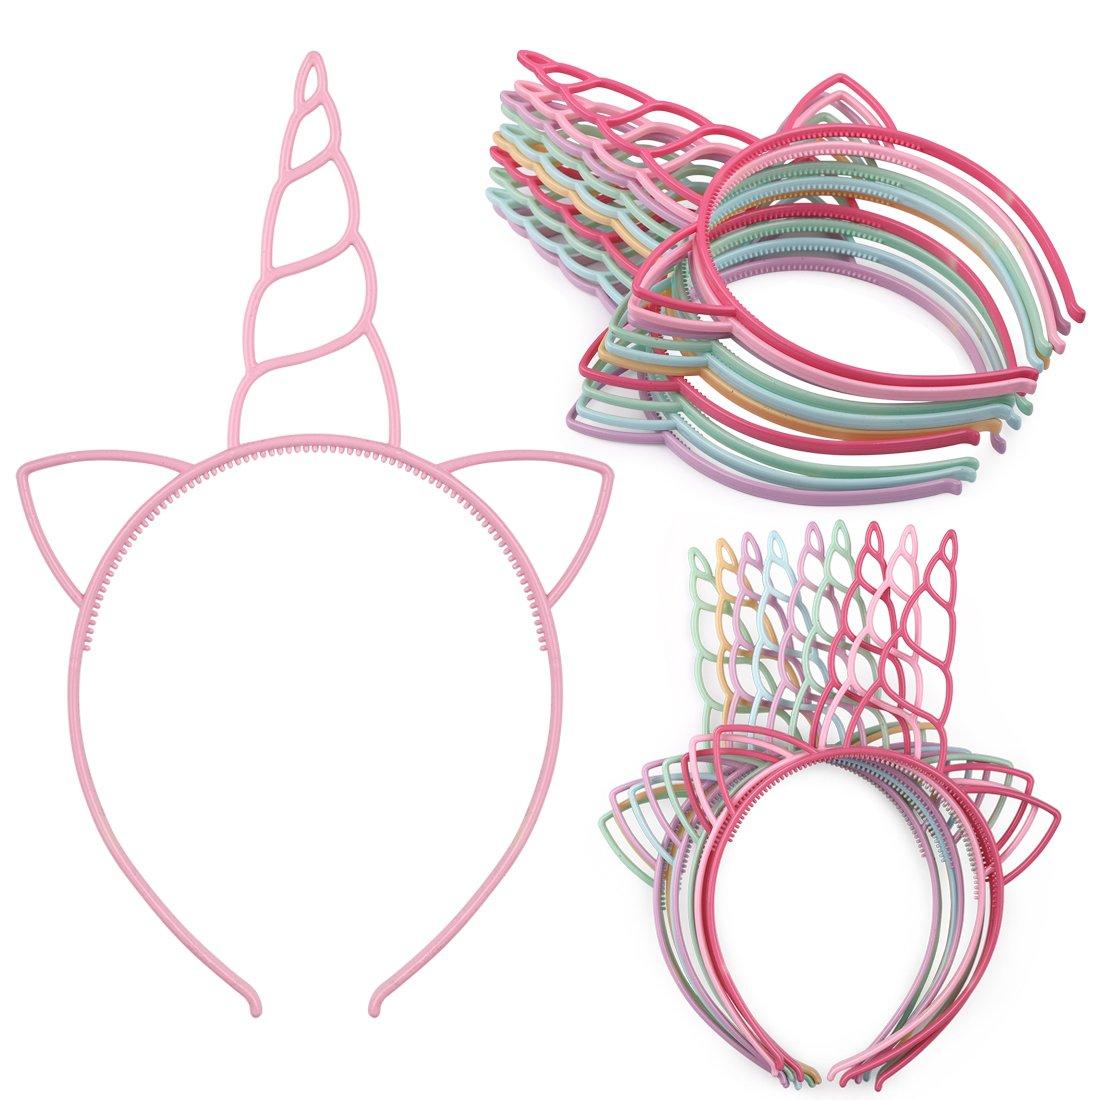 XIMA 12pcs Unicorn Girls Headbands Children Plastic Hairbands Headwear Hair Accessory for Kids Party Decorations(Spring color-Unicorn)